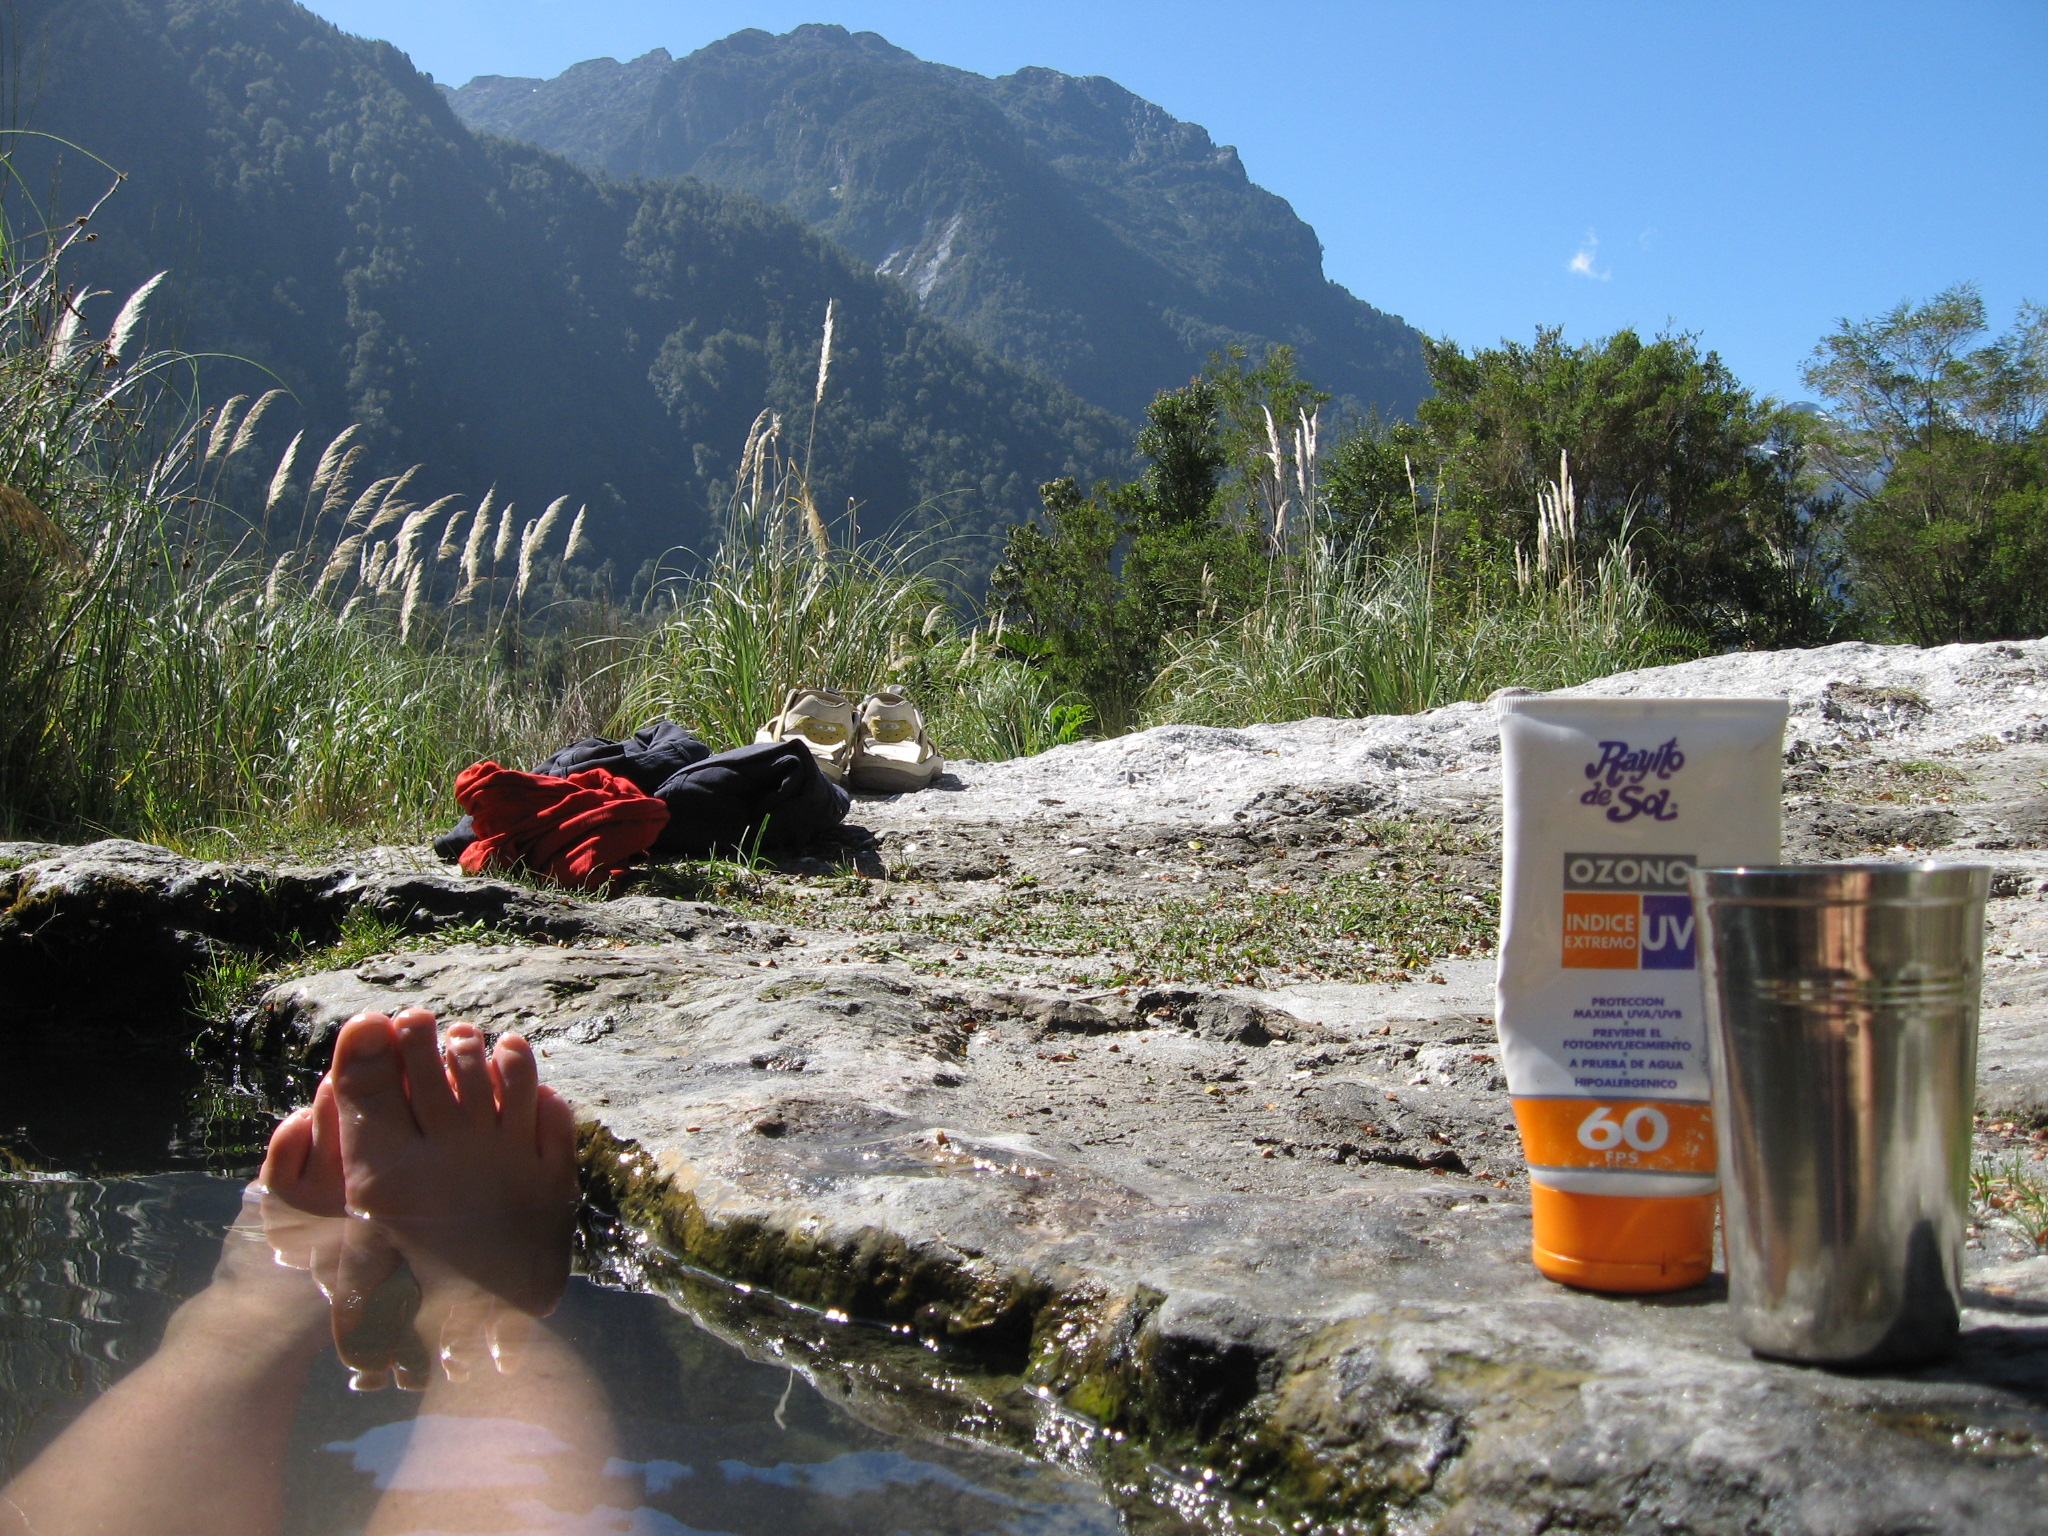 Natural Hot Spring Tourism Patagonia Chile